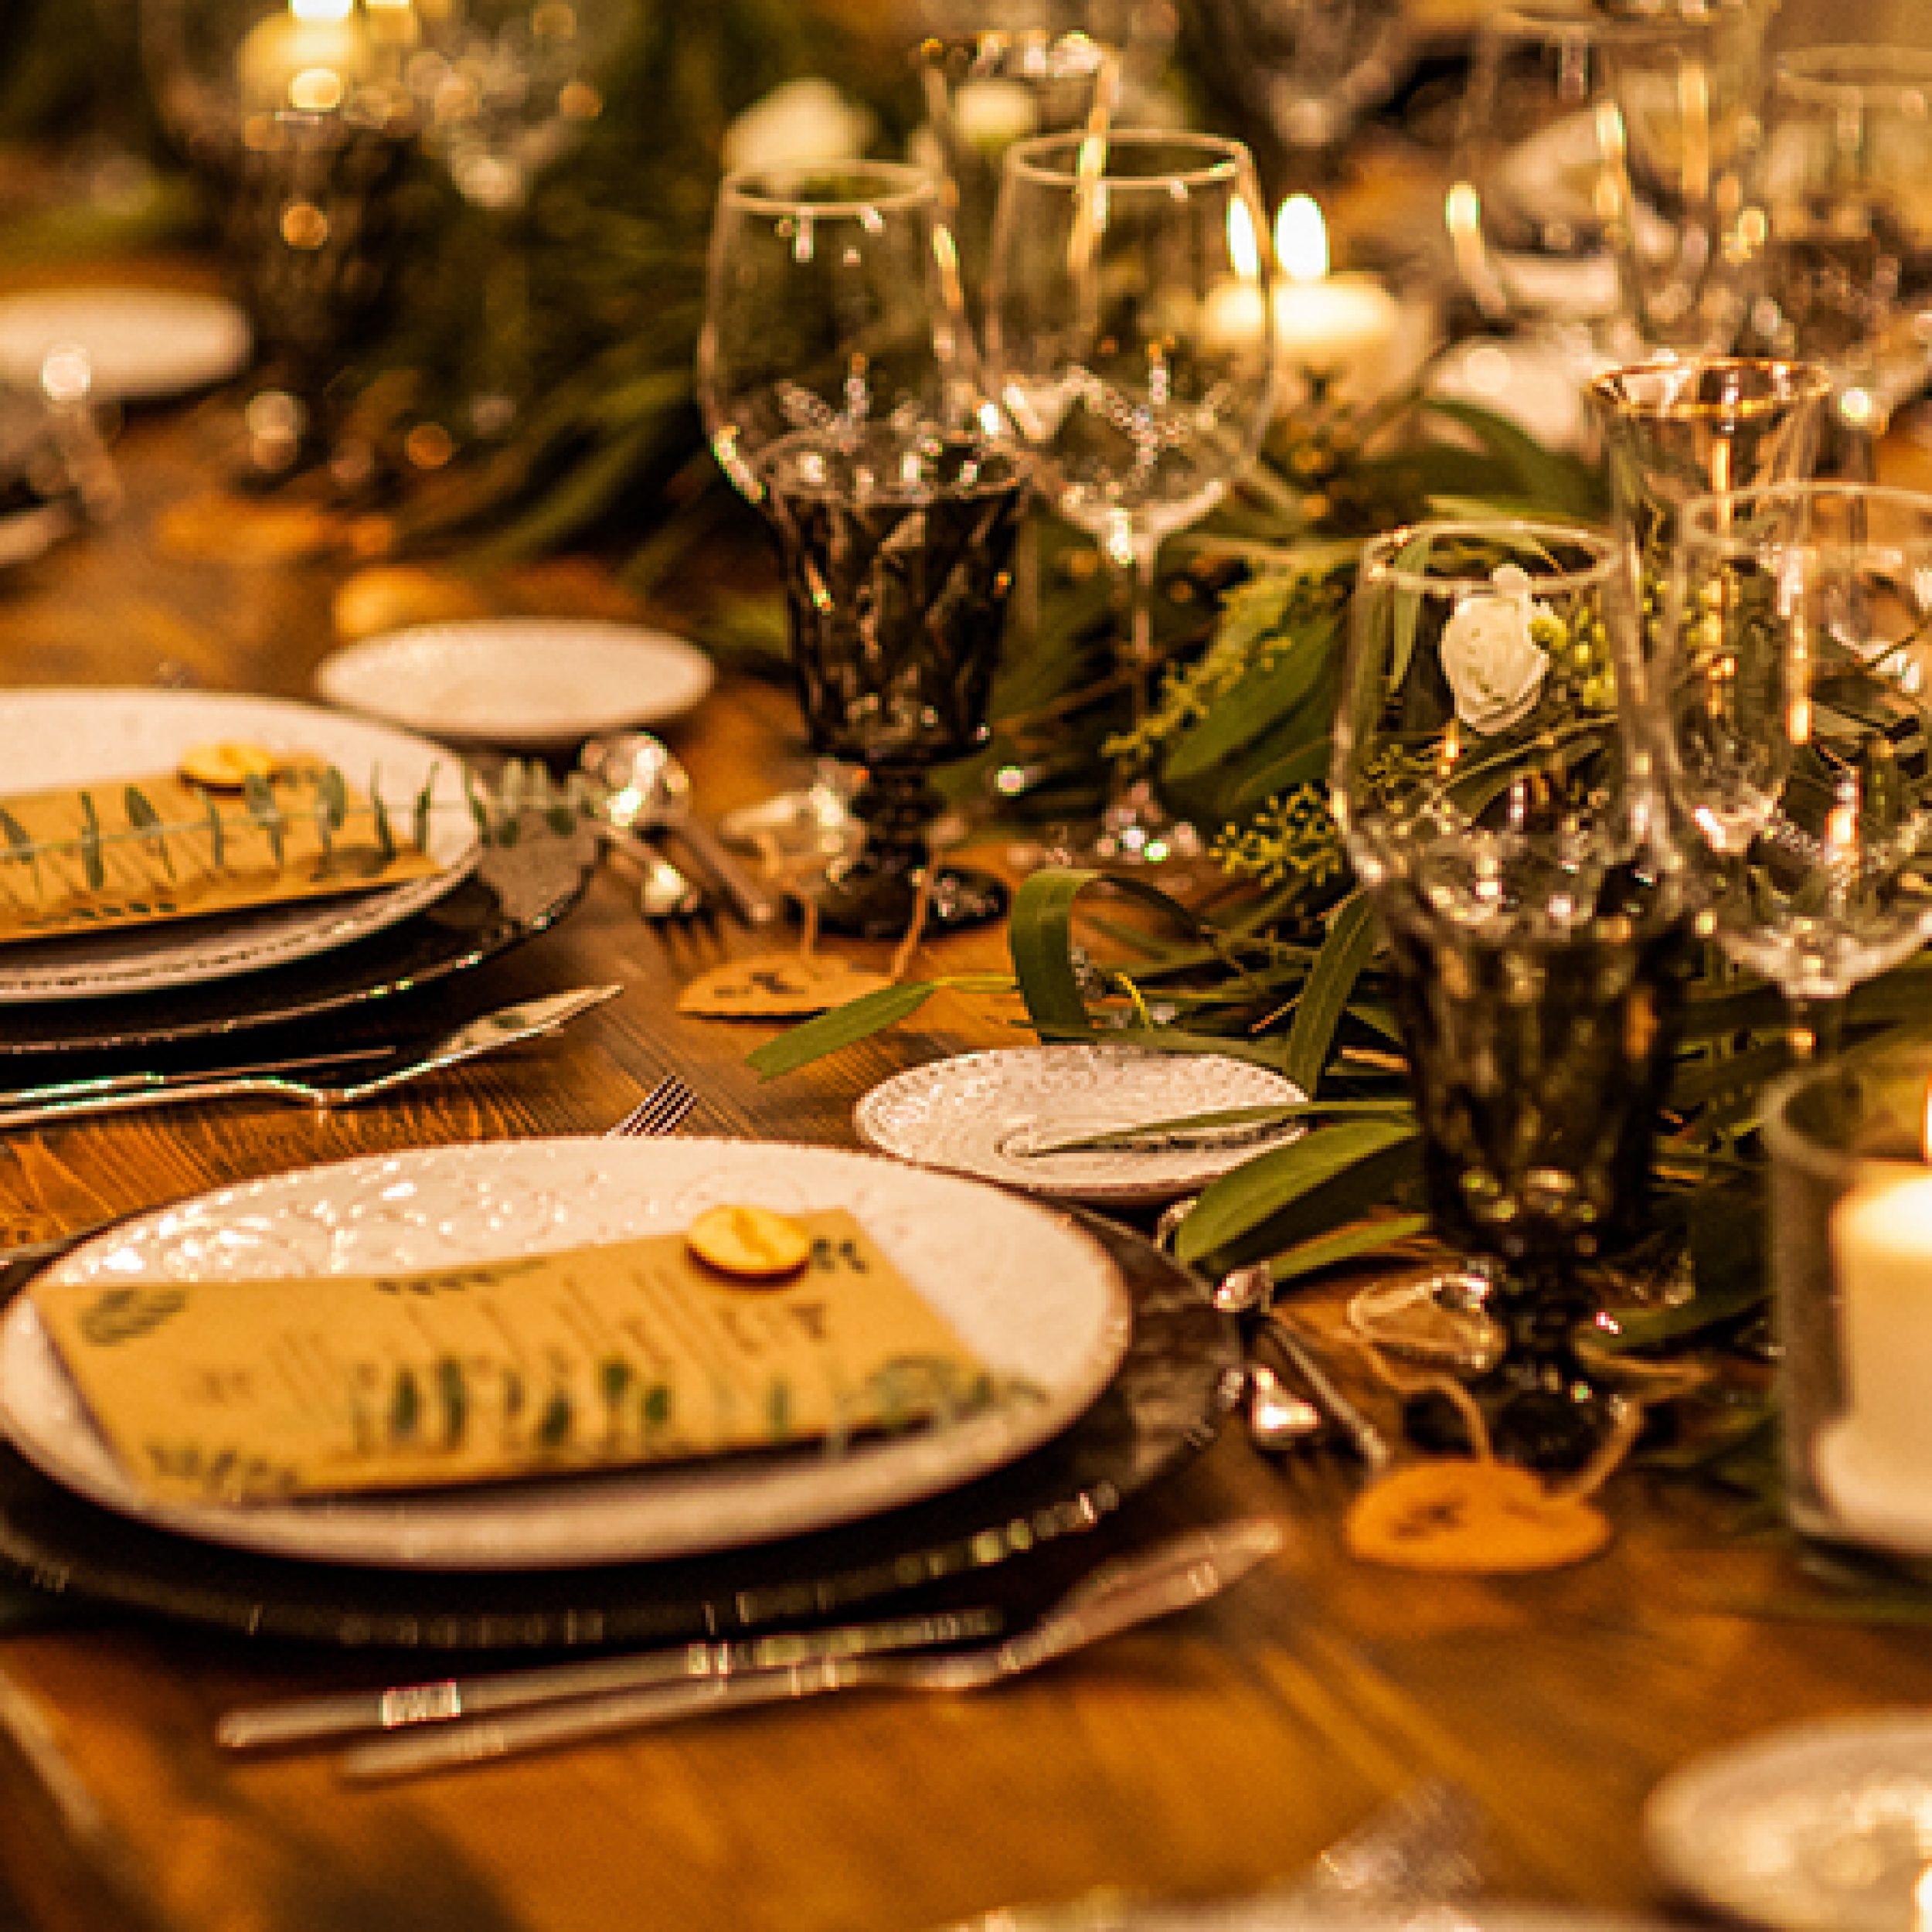 Bodas_wedding_Documentary-Wedding-MaxSegura-Lorenzo Mazzega_0773